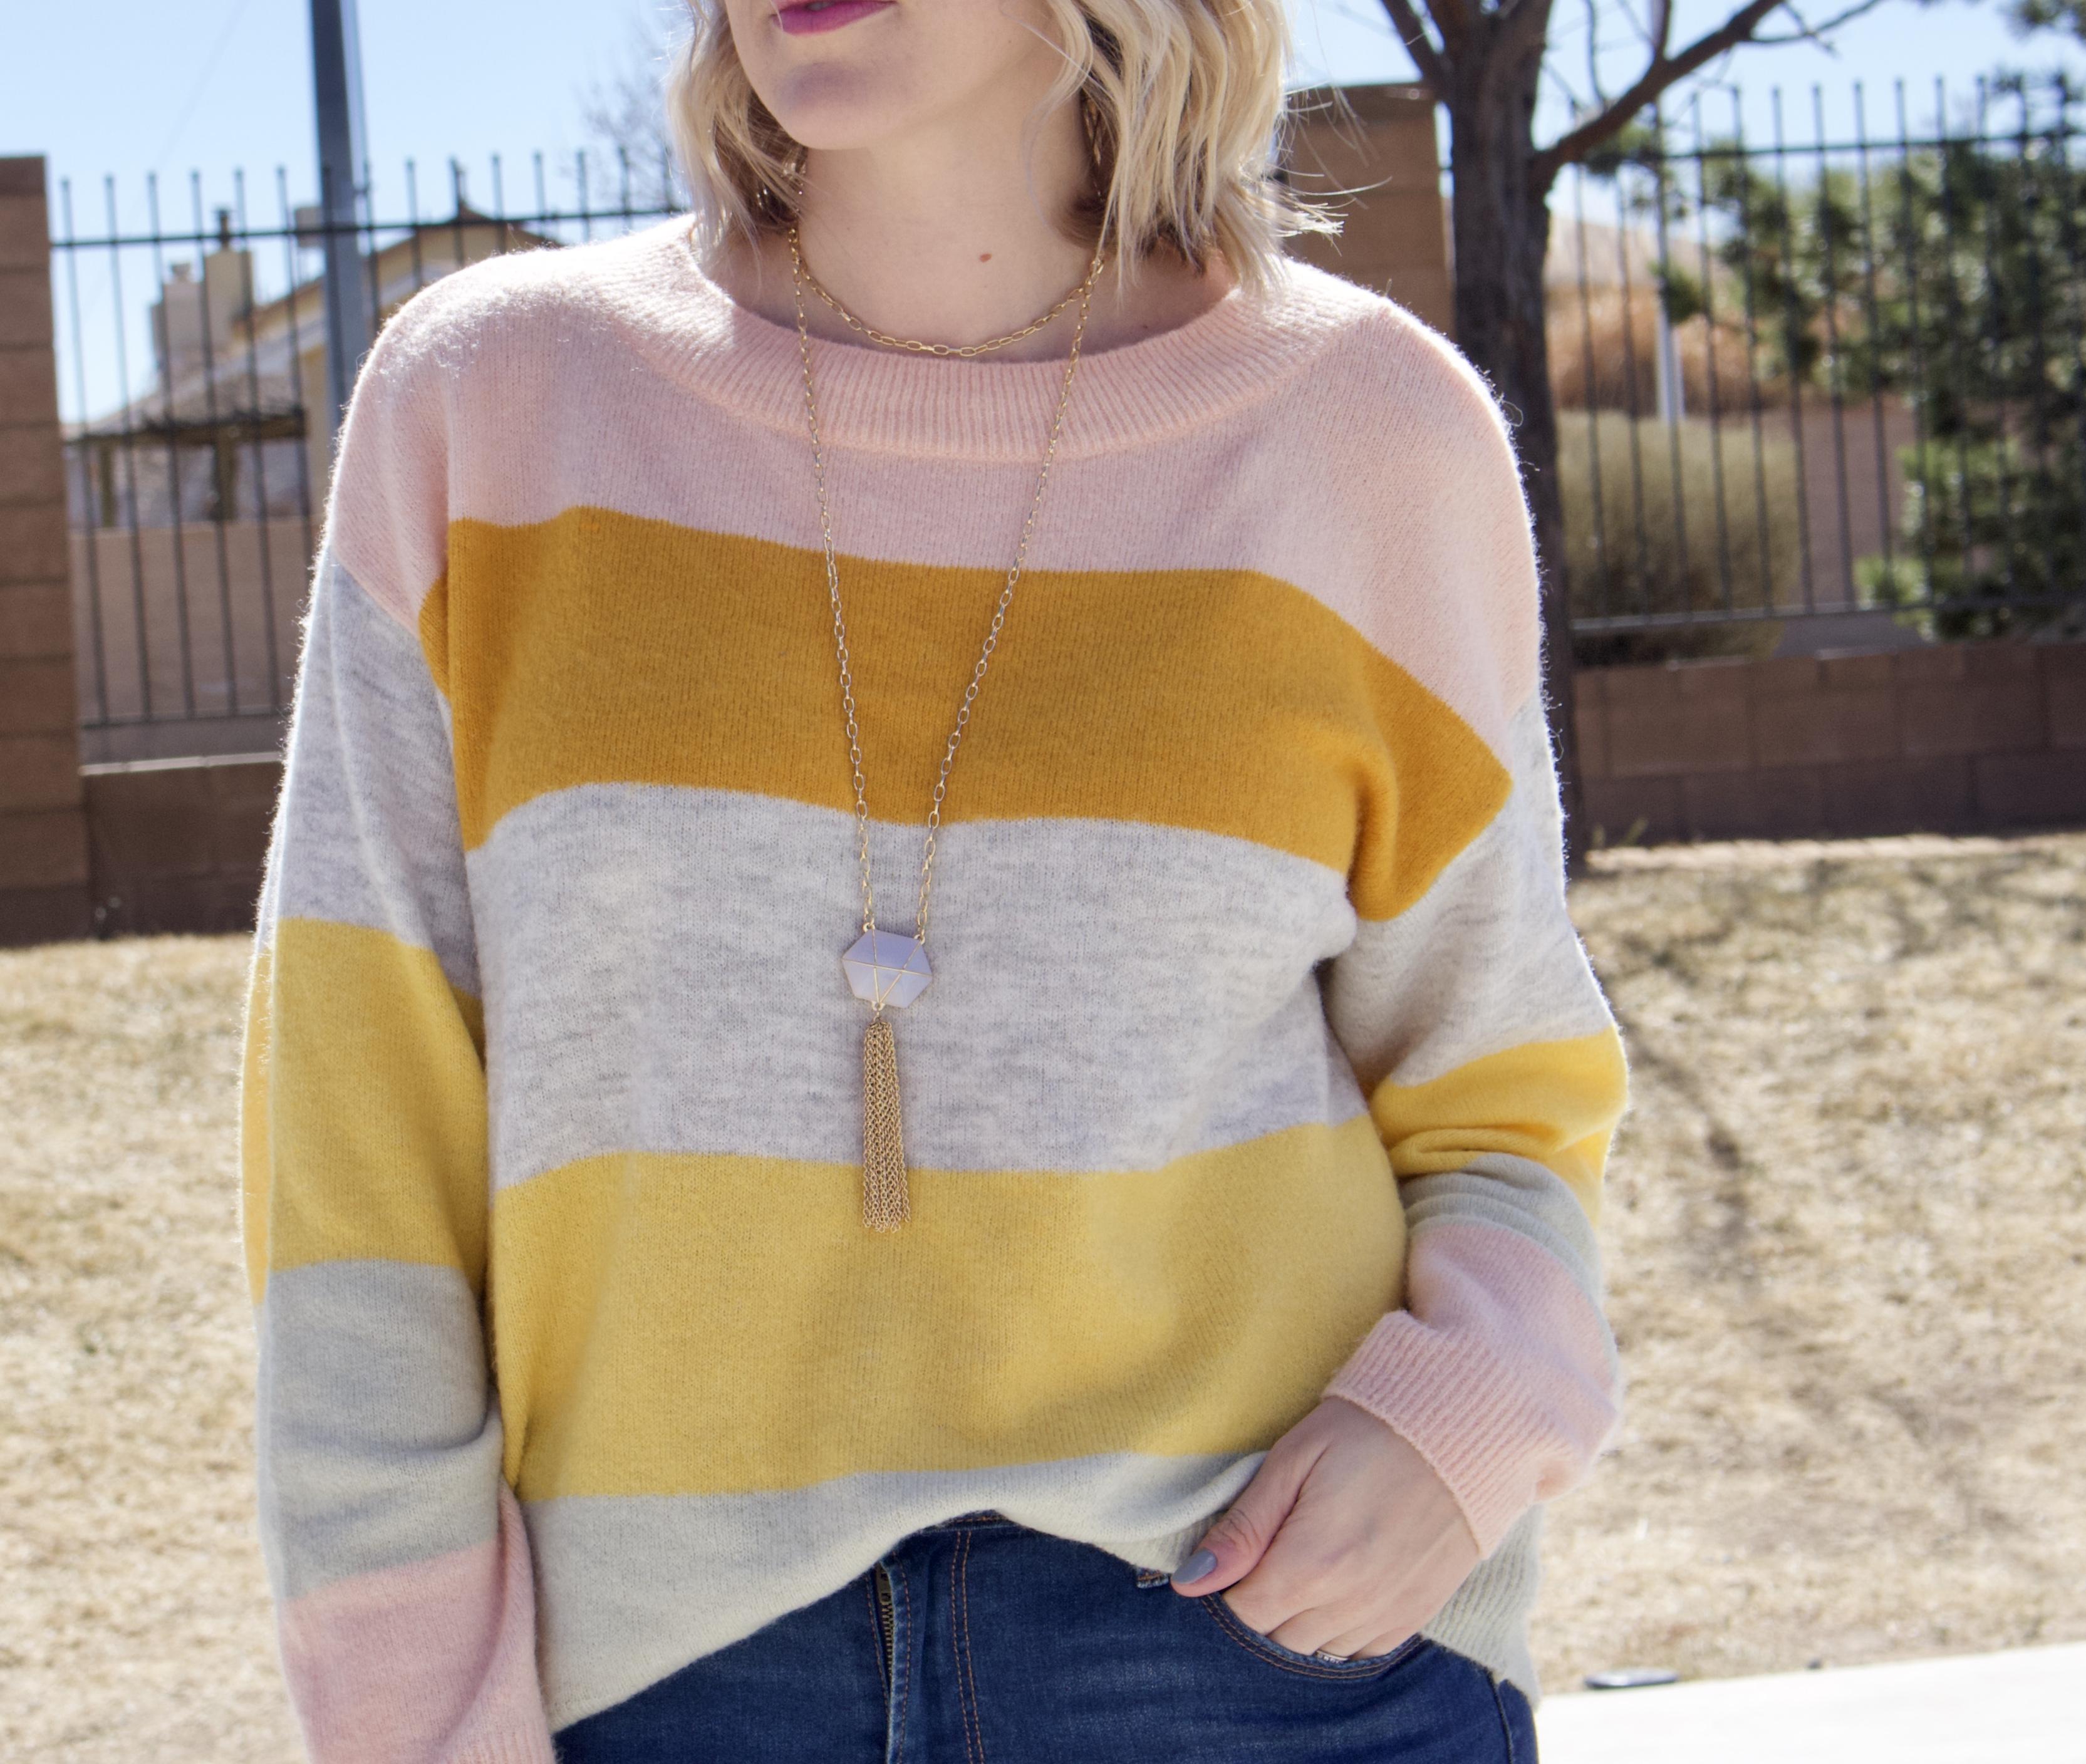 sugarfix by baublebar tassel necklace #baublebar #targetstyle #stripedsweater